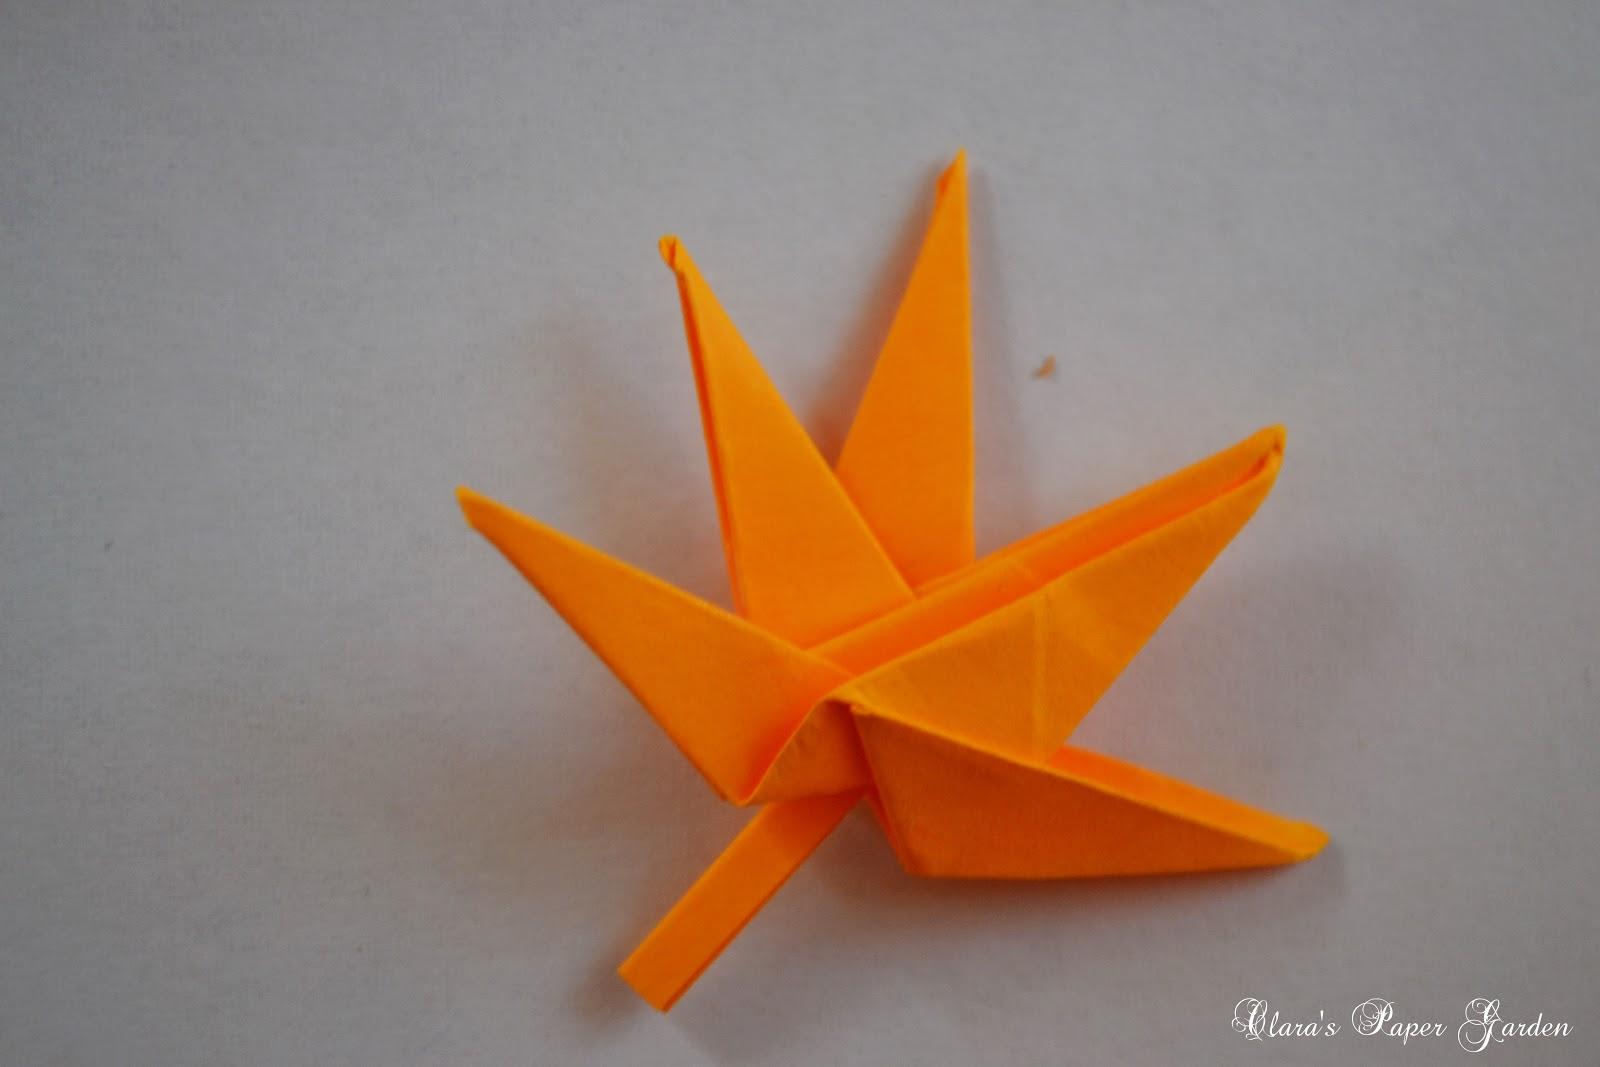 Clara's Paper Garden: Tutorials - photo#50